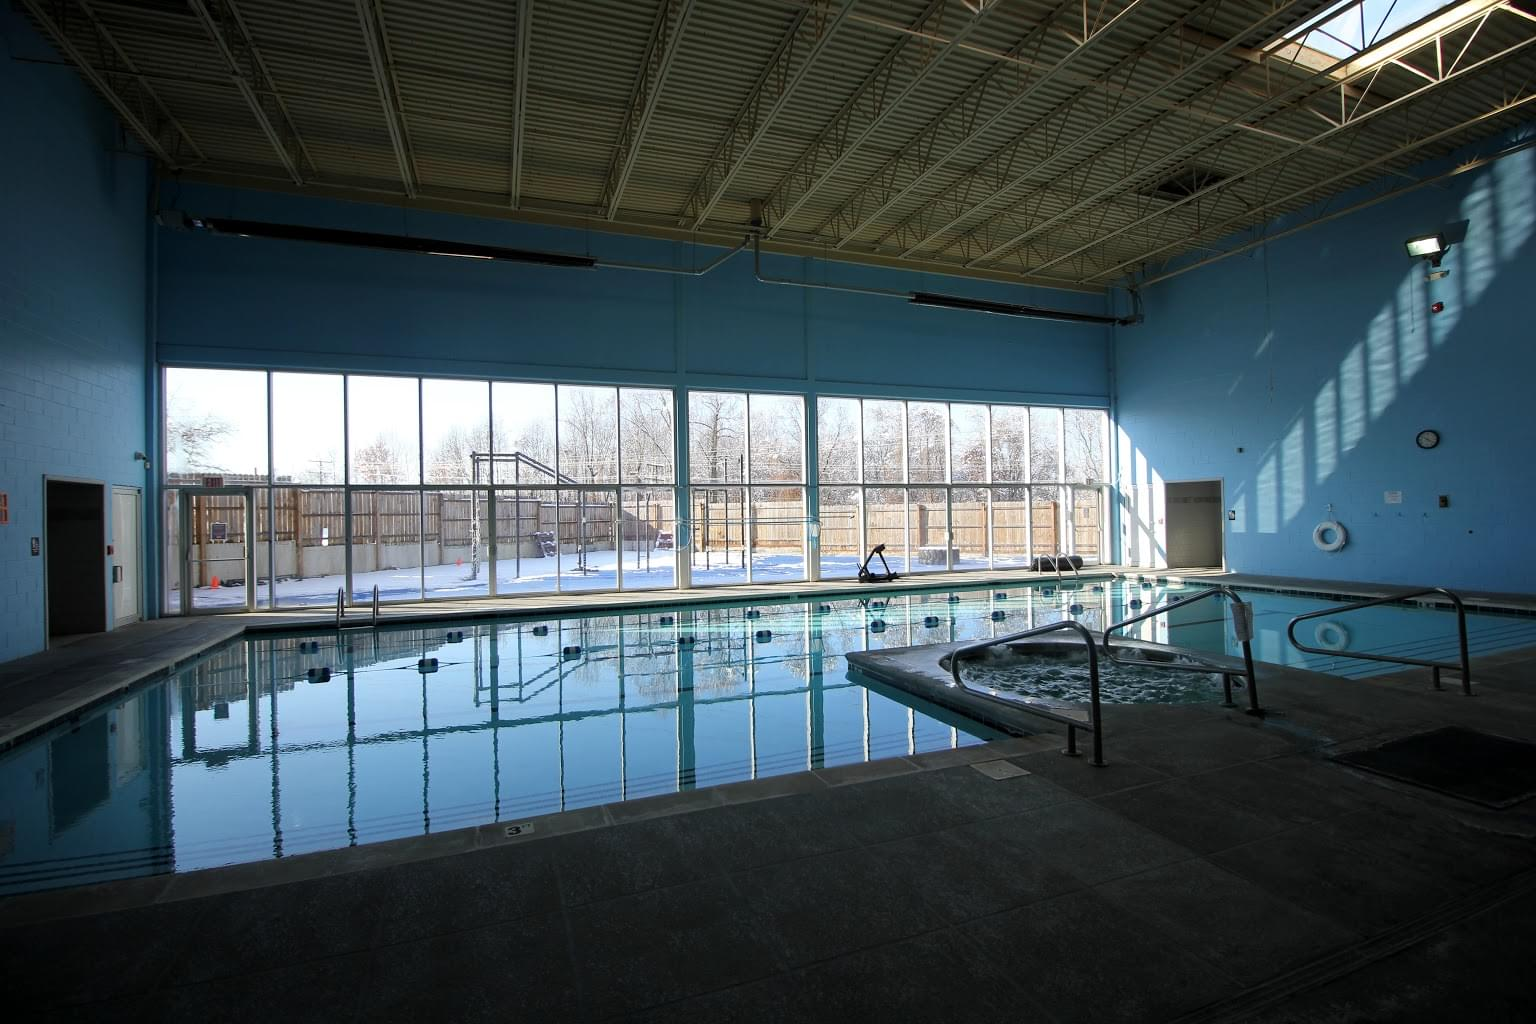 Crunch Fitness Gym in Richmond, VA swimming pool